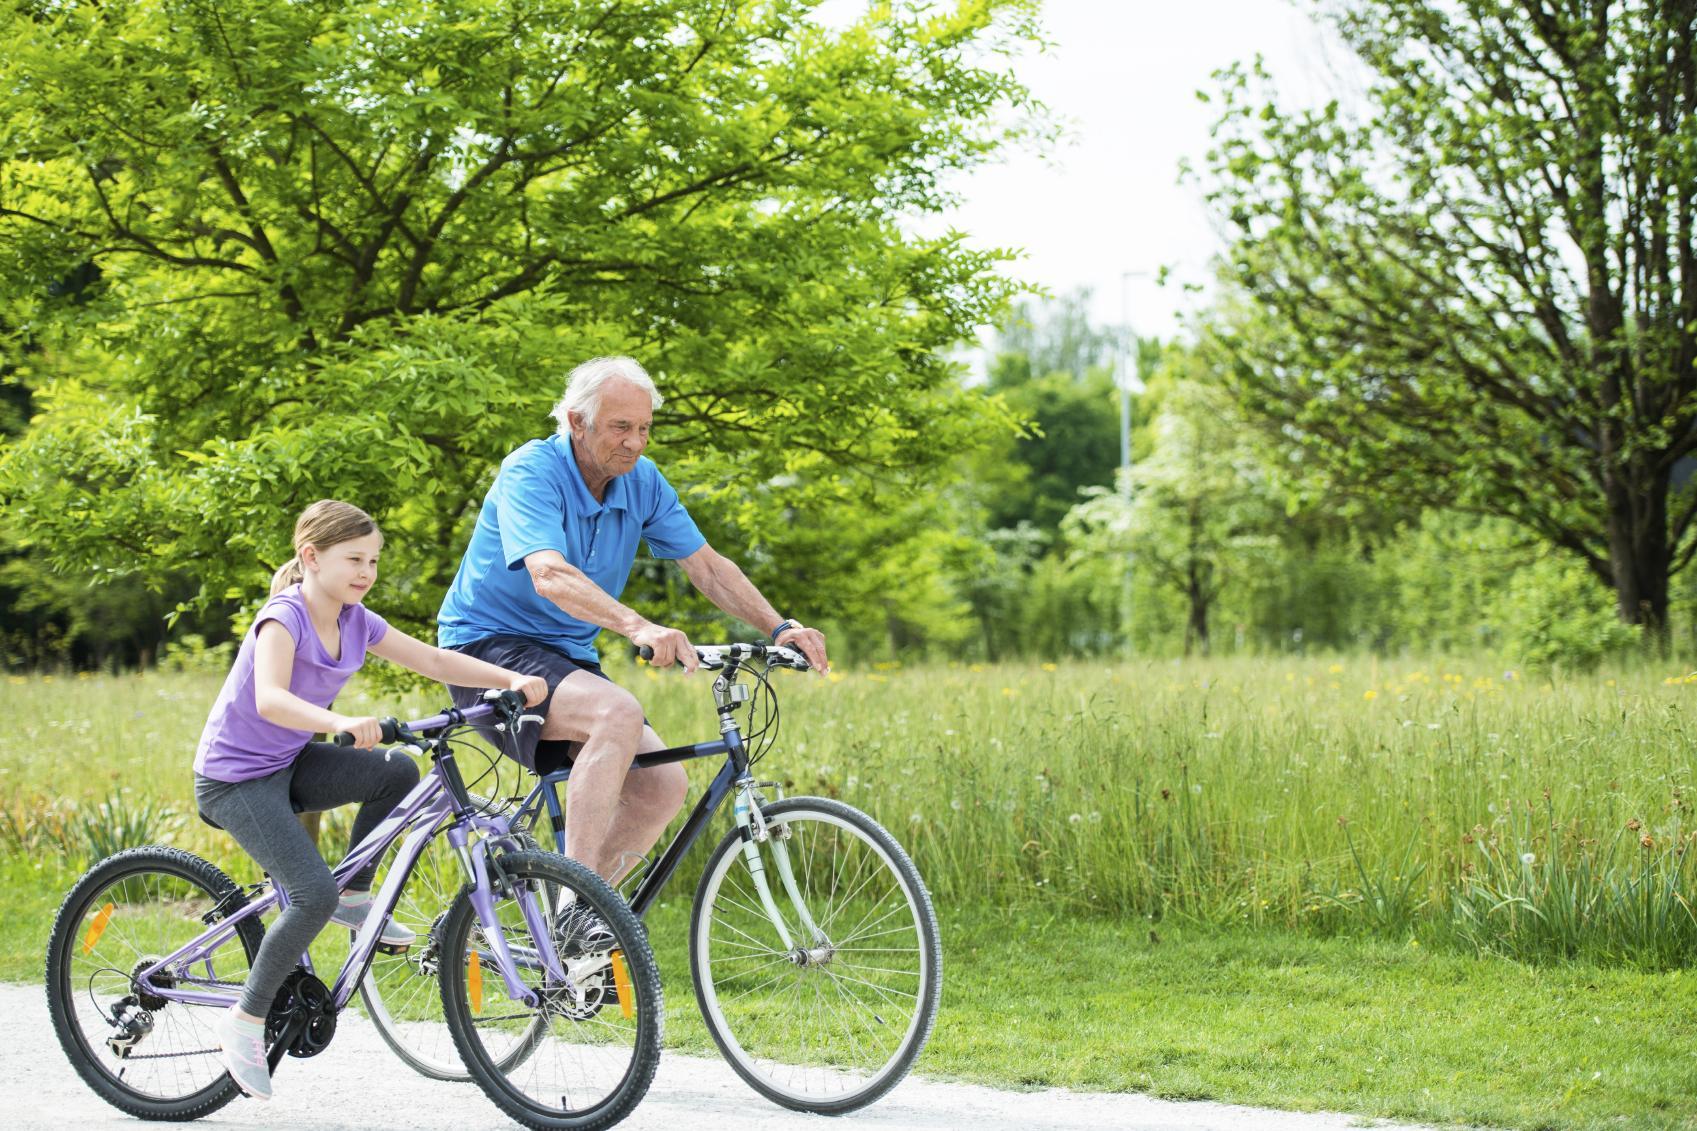 Young girl biking with grandpa